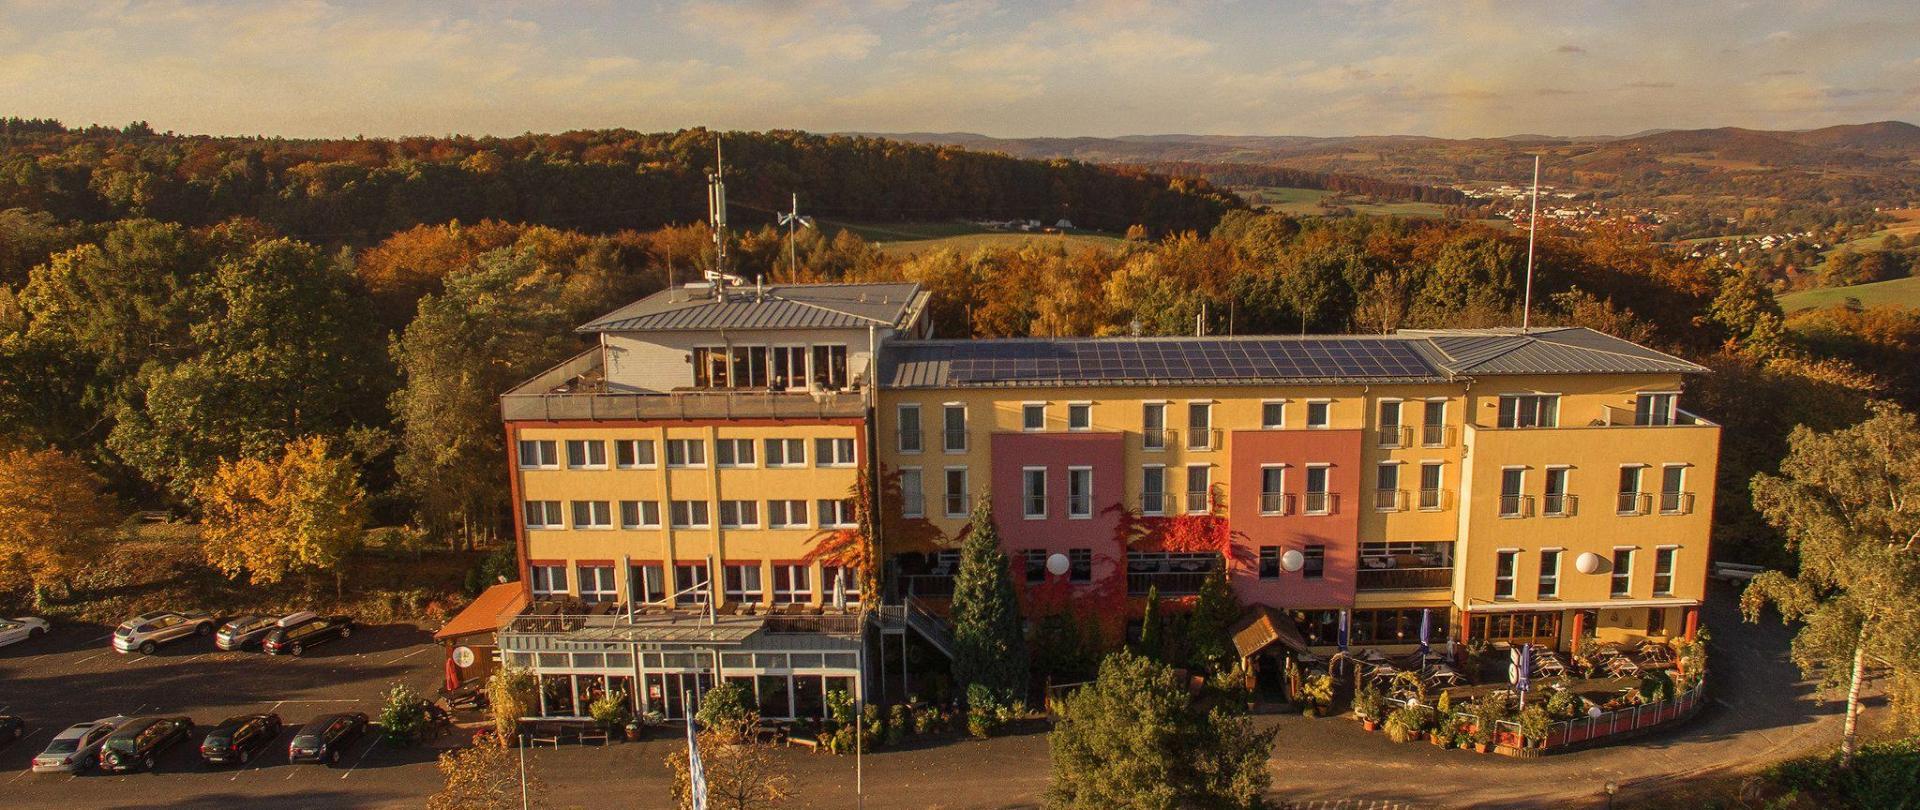 Hösbach Schwimmbad landhotel klingerhof hösbach germany